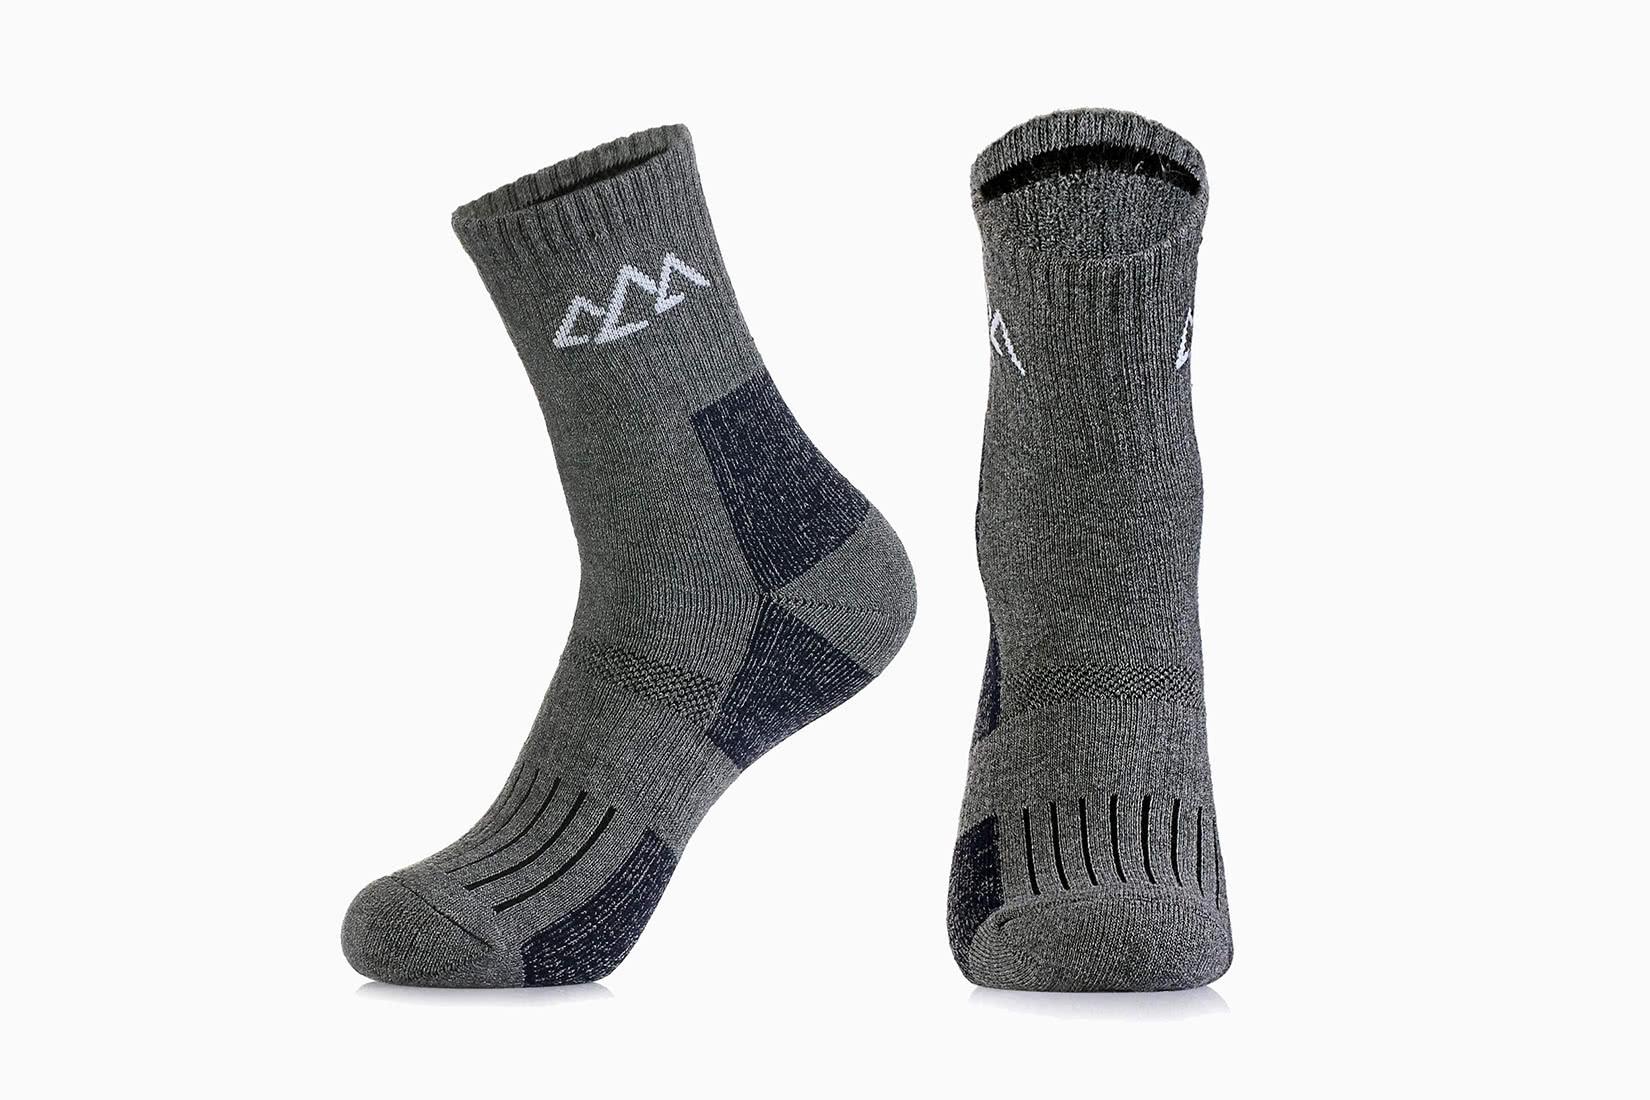 best socks men hiking innotree review - Luxe Digital